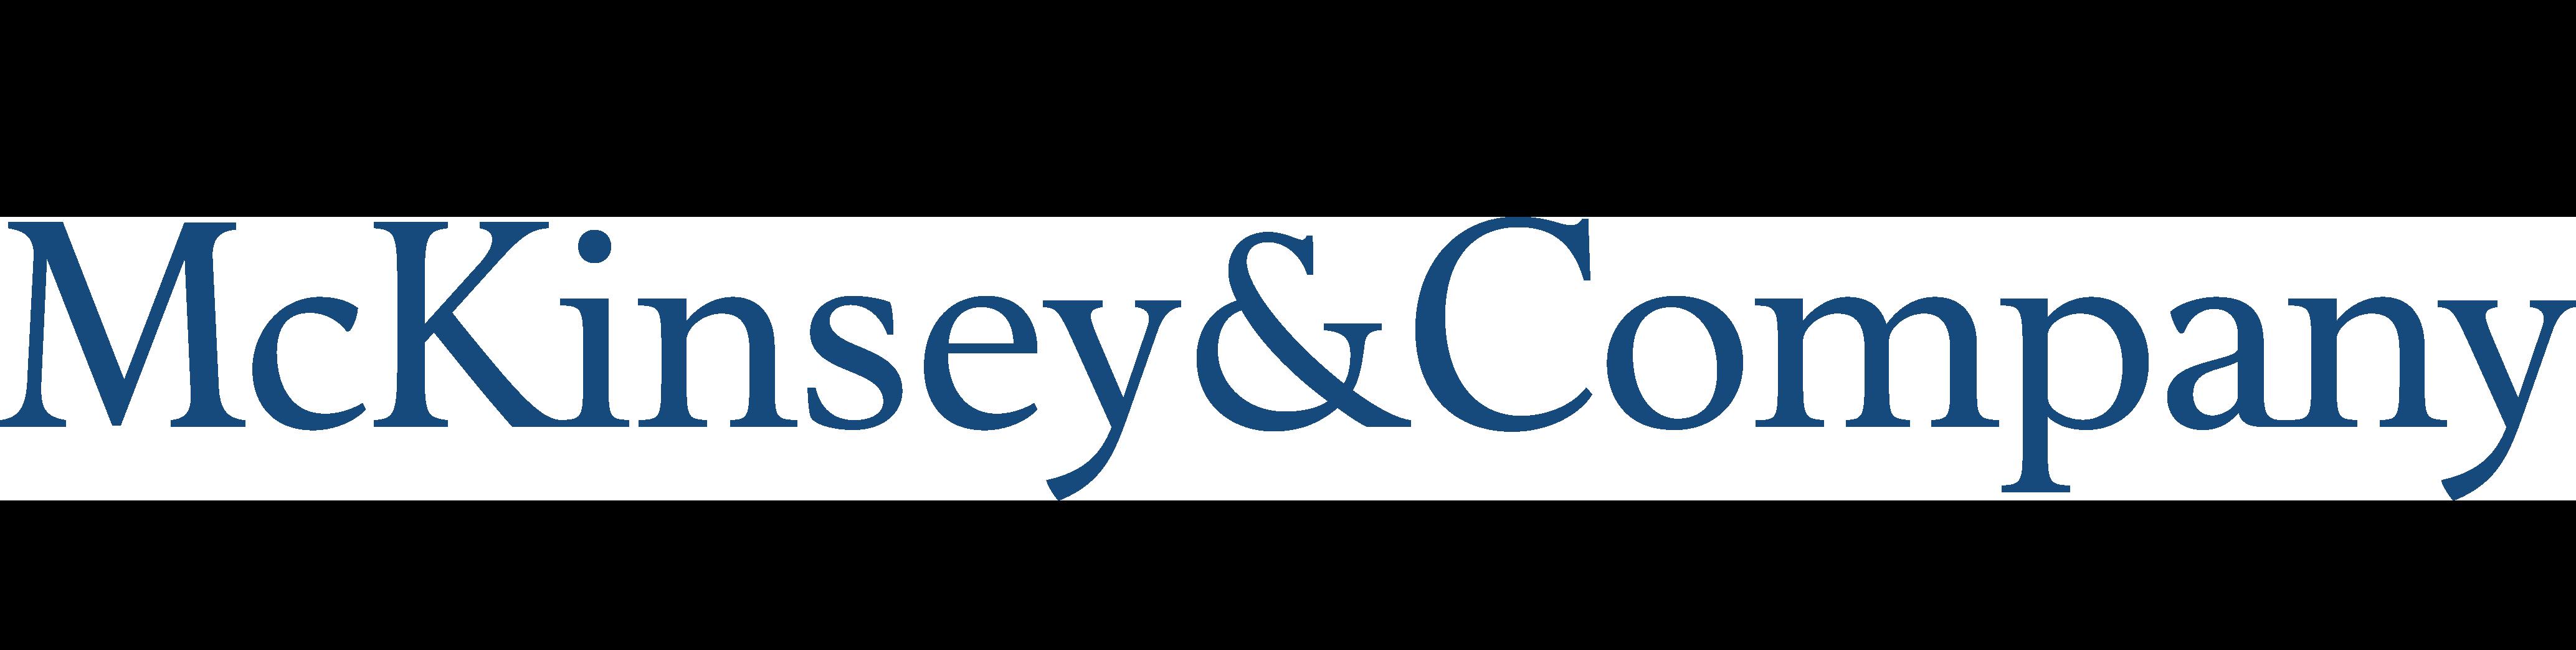 McKinsey & Company logo